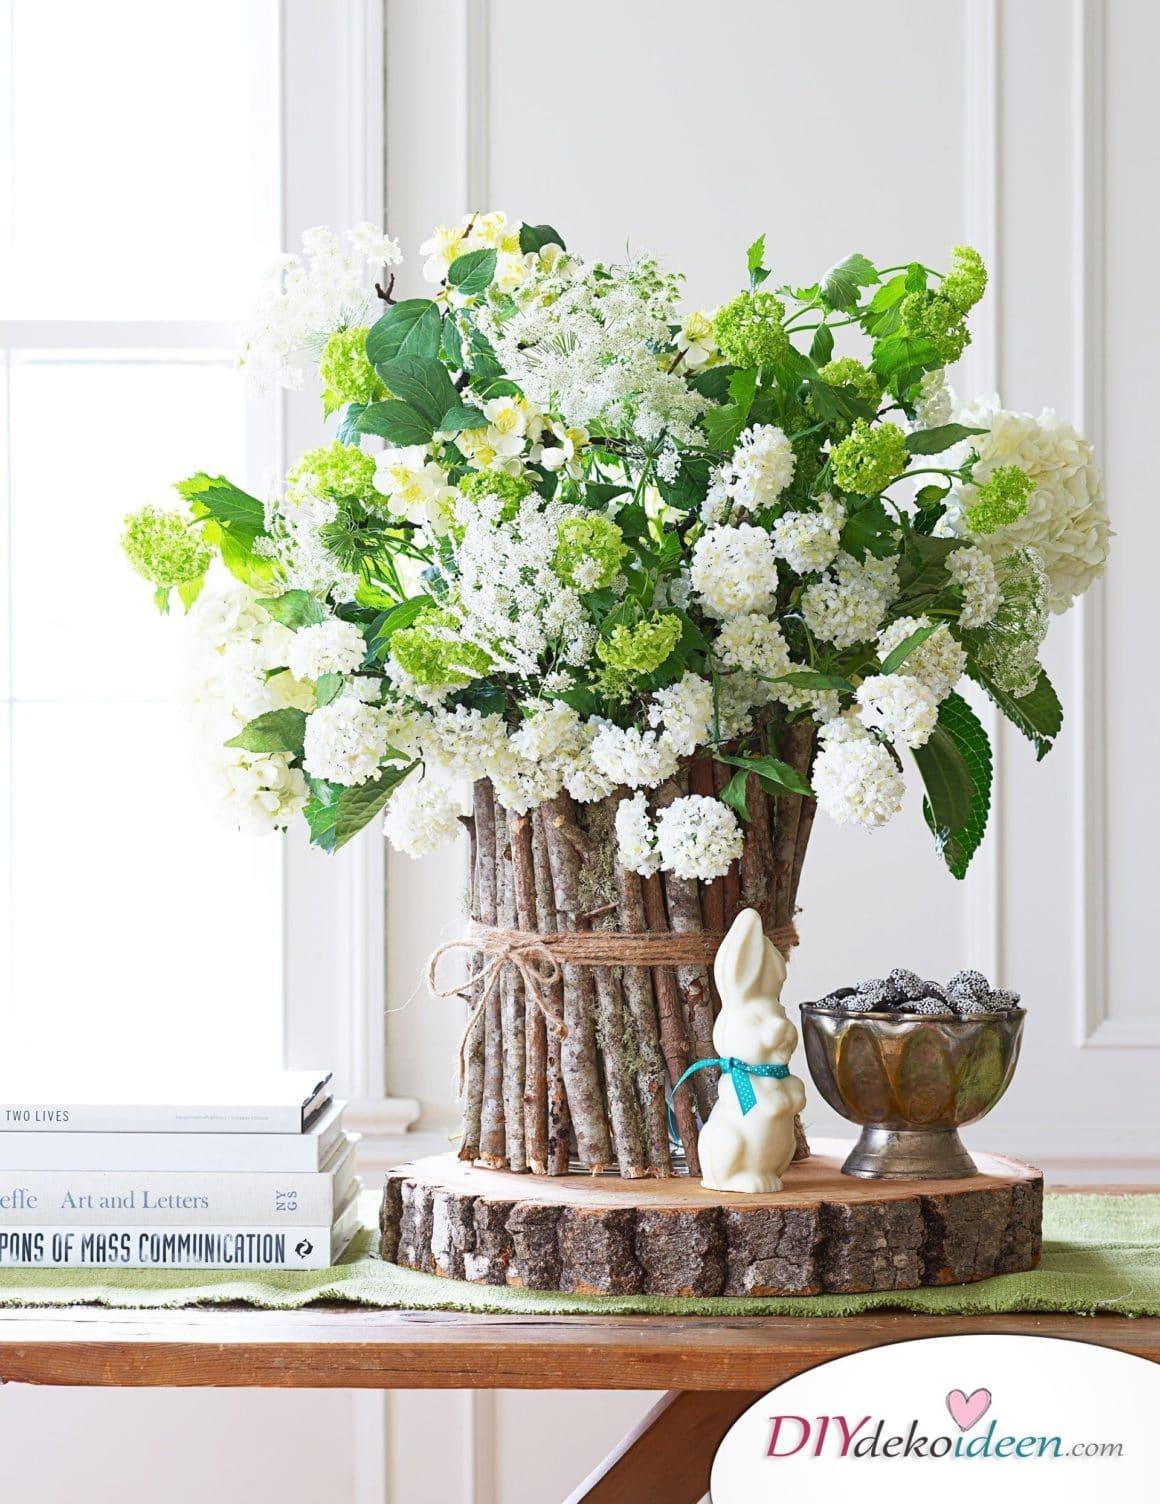 Frühlingstischdeko, Tischdeko, Tisch dekorieren, Blumendeko, Blumen Tischdeko, Frühling, Frühlingsdeko, Frühling dekoireren, Frühling Dekoidee, Frühling Tischdeko